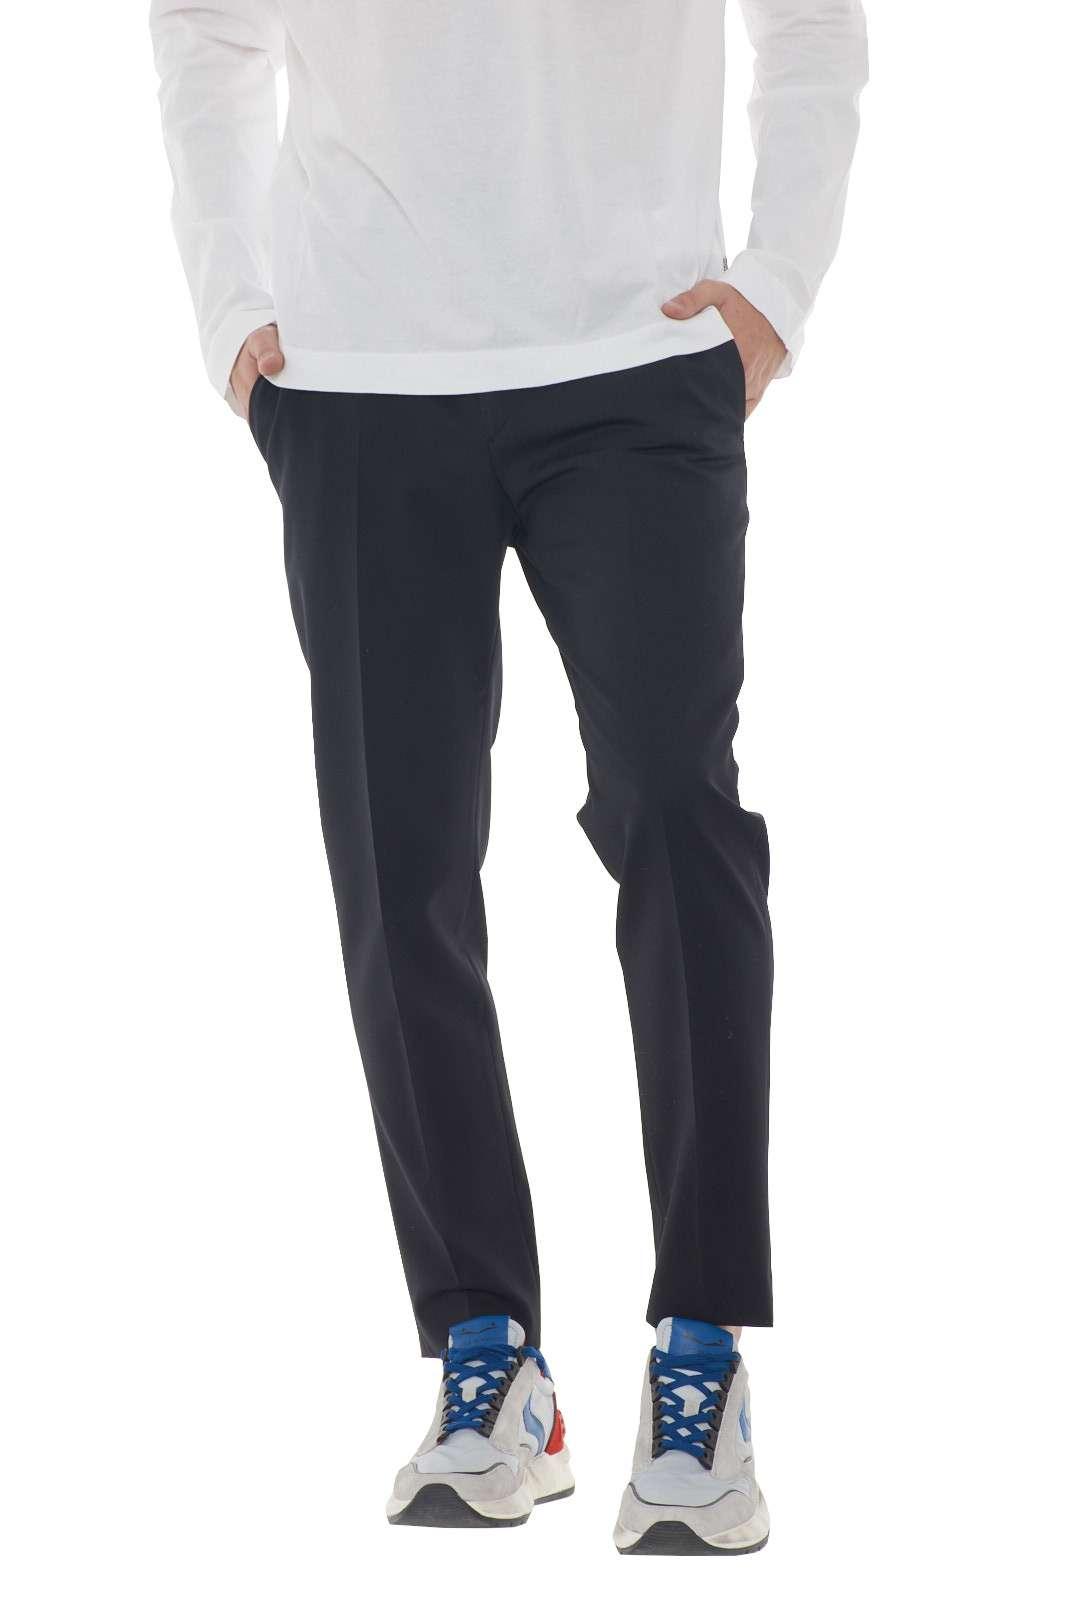 https://www.parmax.com/media/catalog/product/a/i/AI-outlet_parmax-pantaloni-uomo-Calvin-Klein-K10K104263-A.jpg